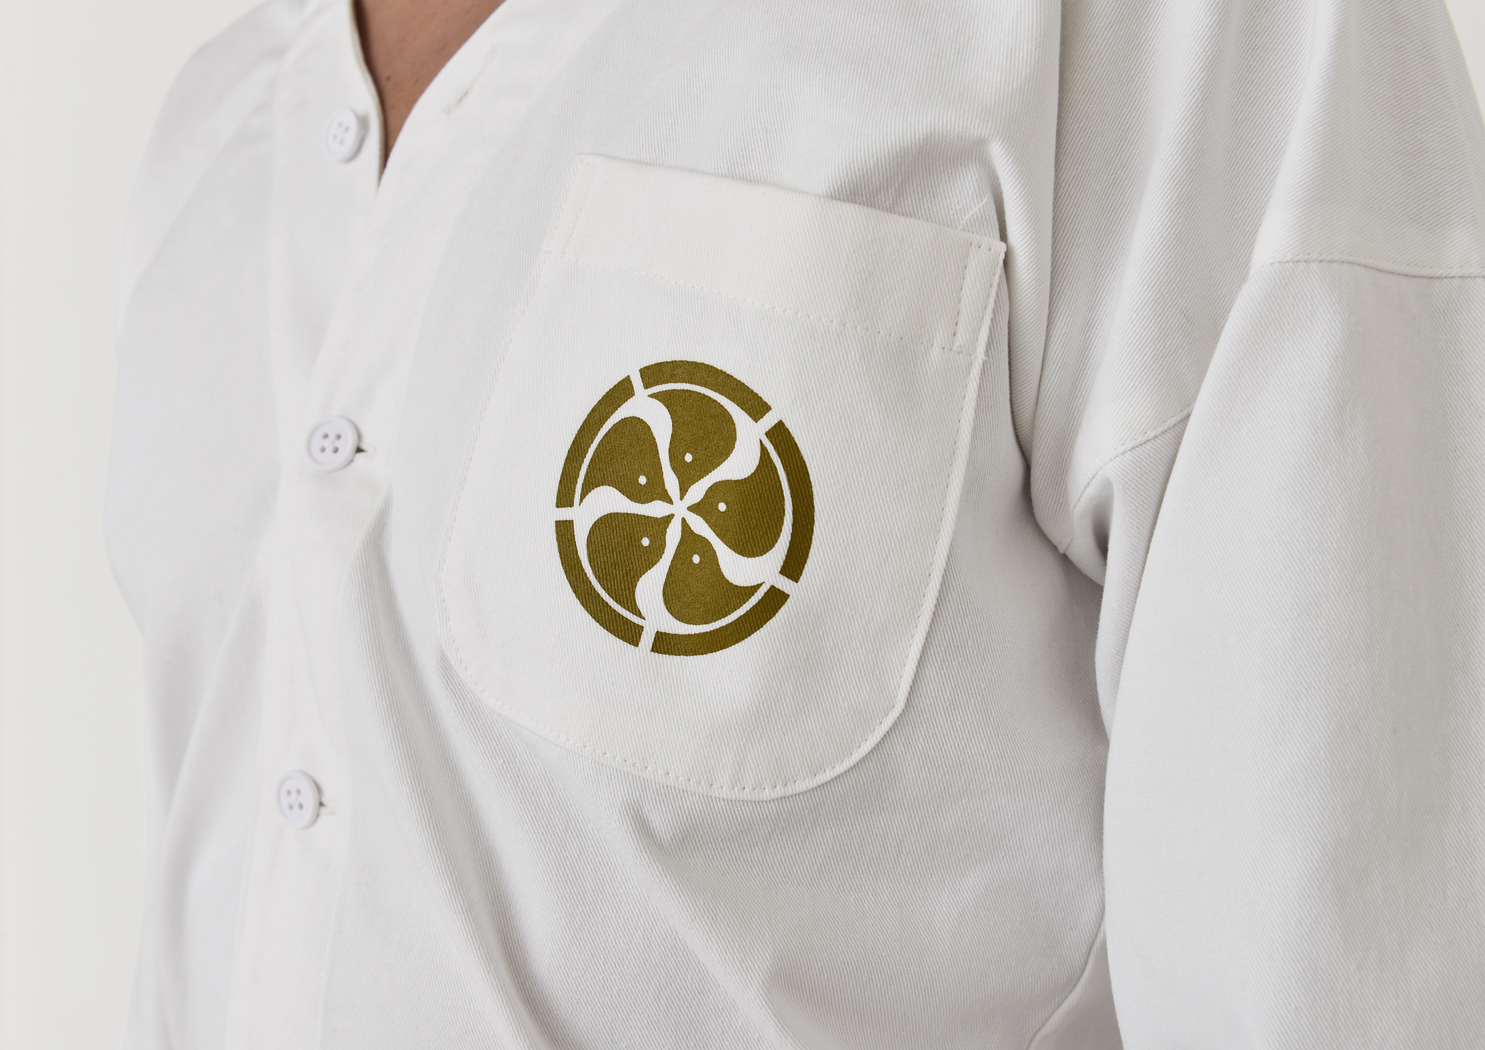 issekigocho uniform